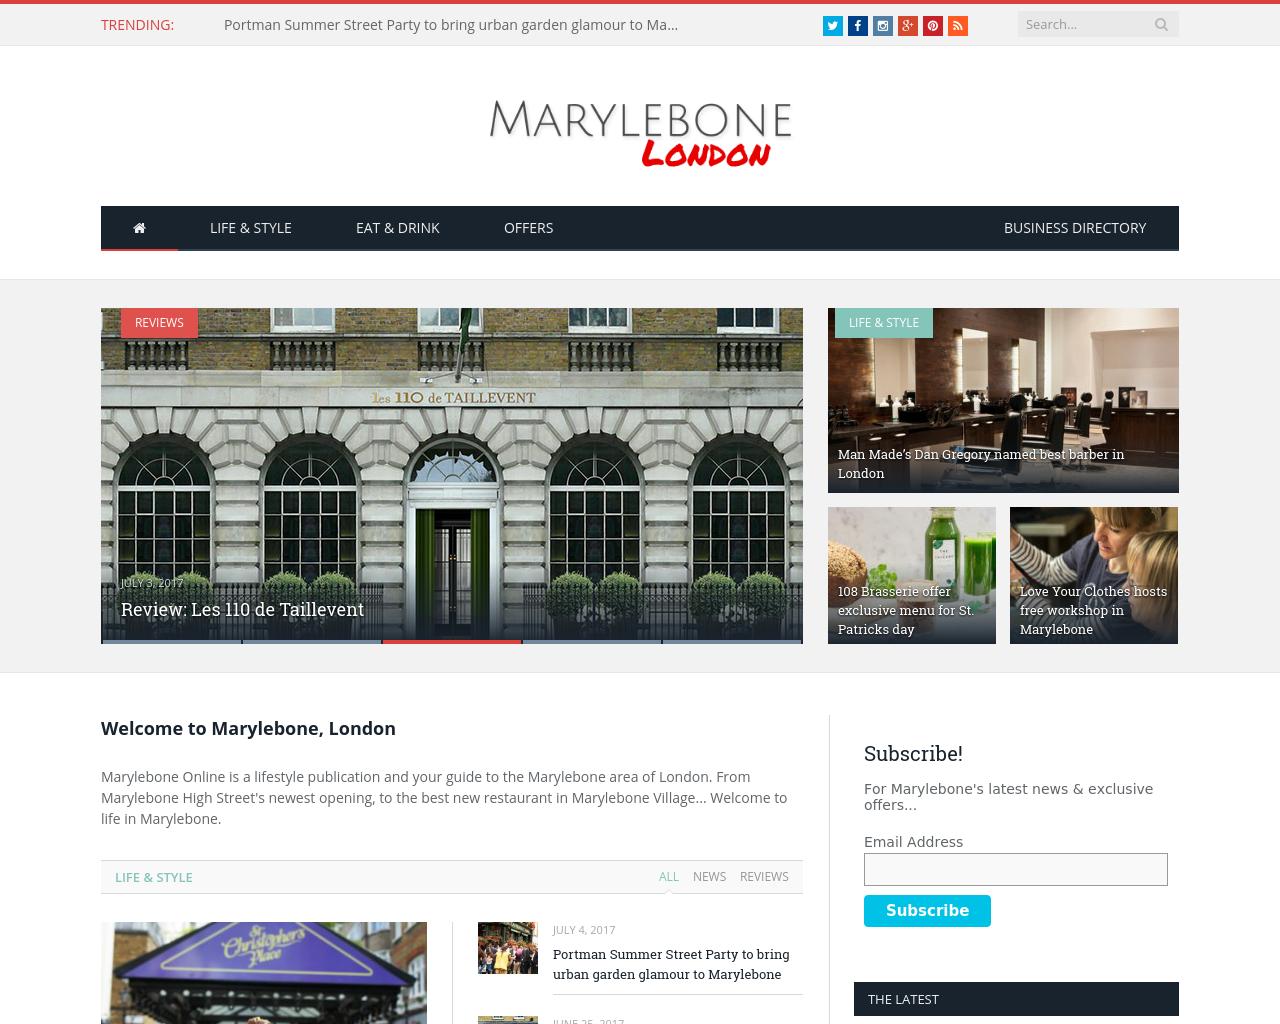 MARYLEBONE-London-Advertising-Reviews-Pricing